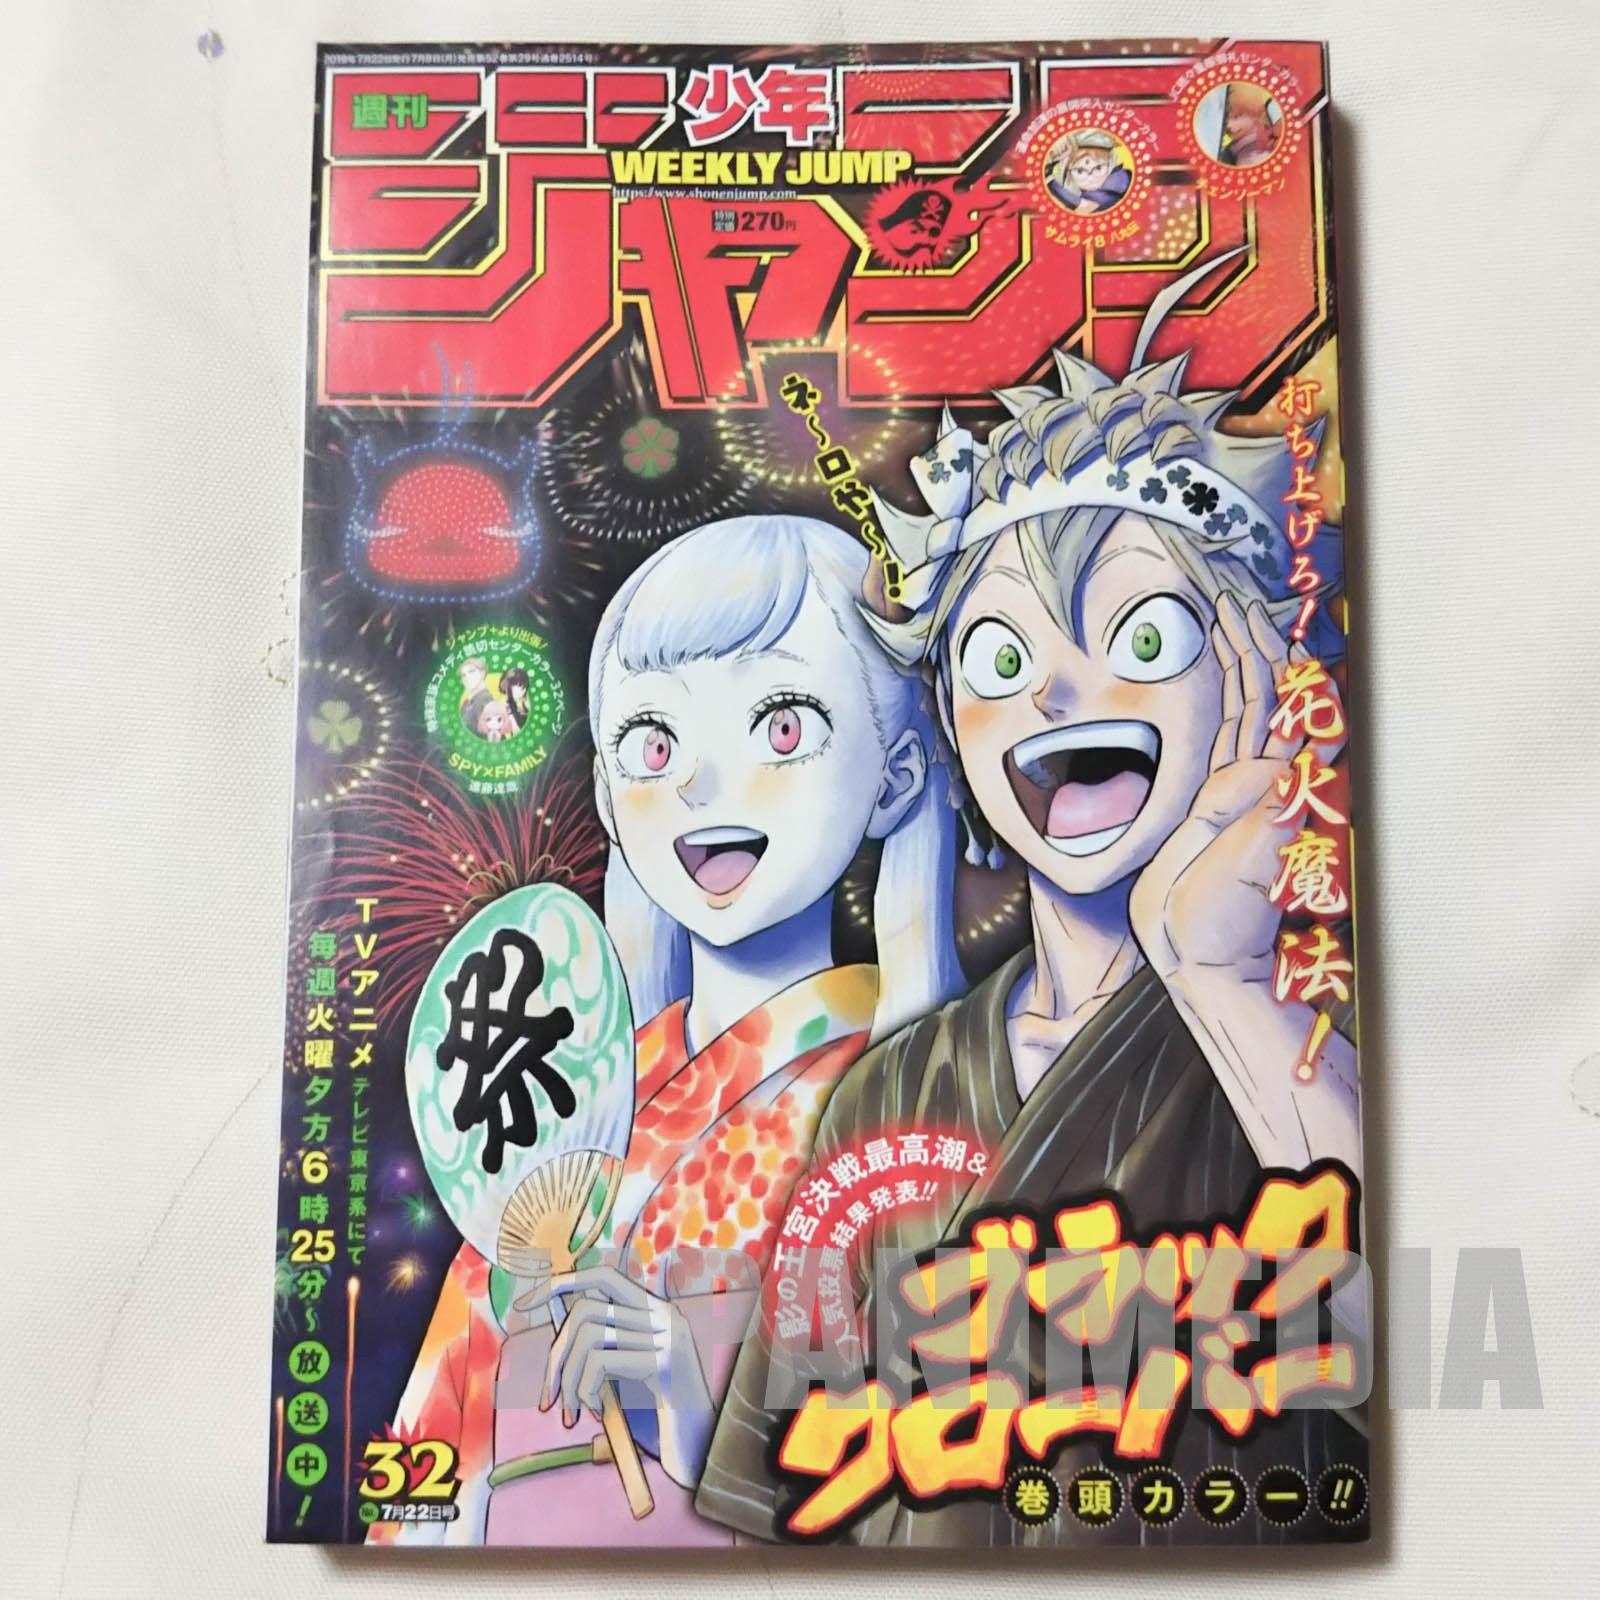 Weekly Shonen JUMP Vol.32 2019 Black Clover / Japanese Magazine JAPAN MANGA